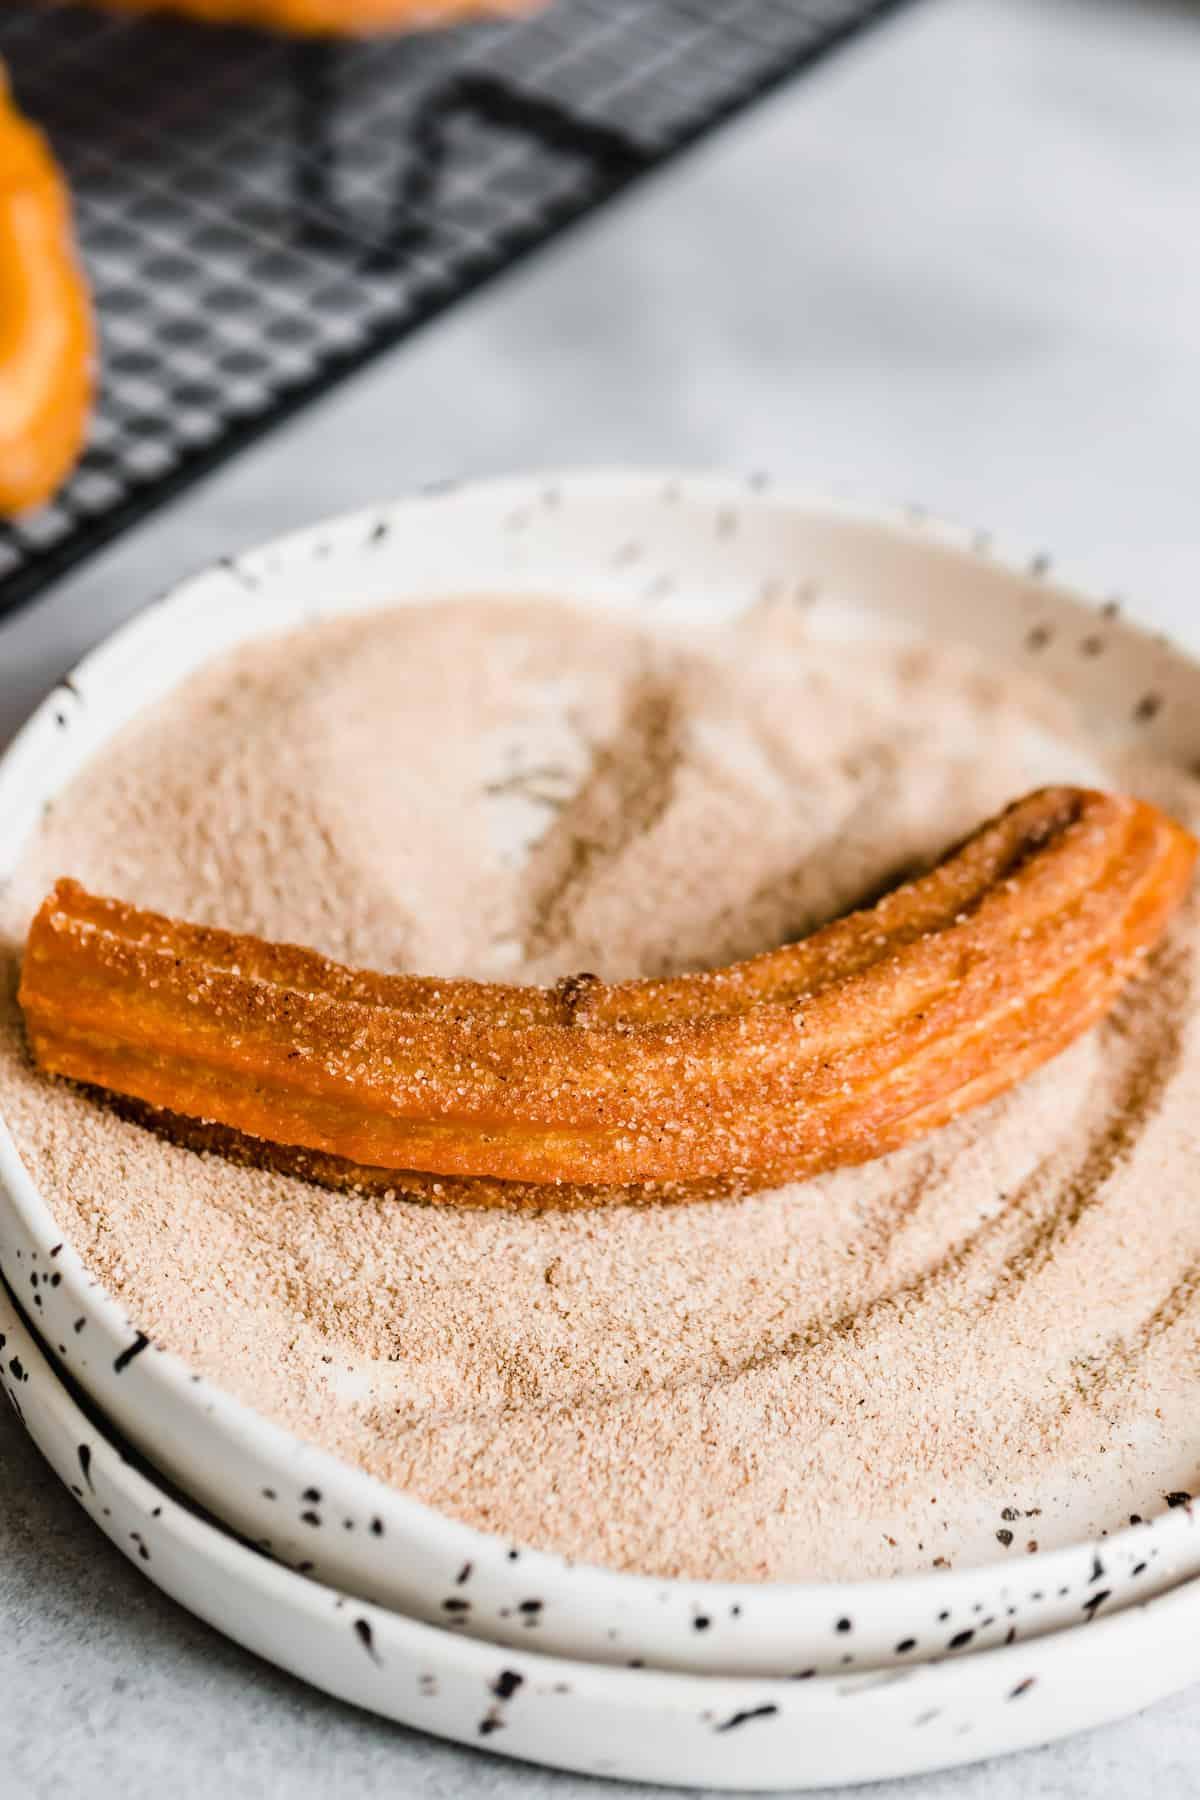 A Churro Inside a Shallow Bowl Filled with Cinnamon Sugar